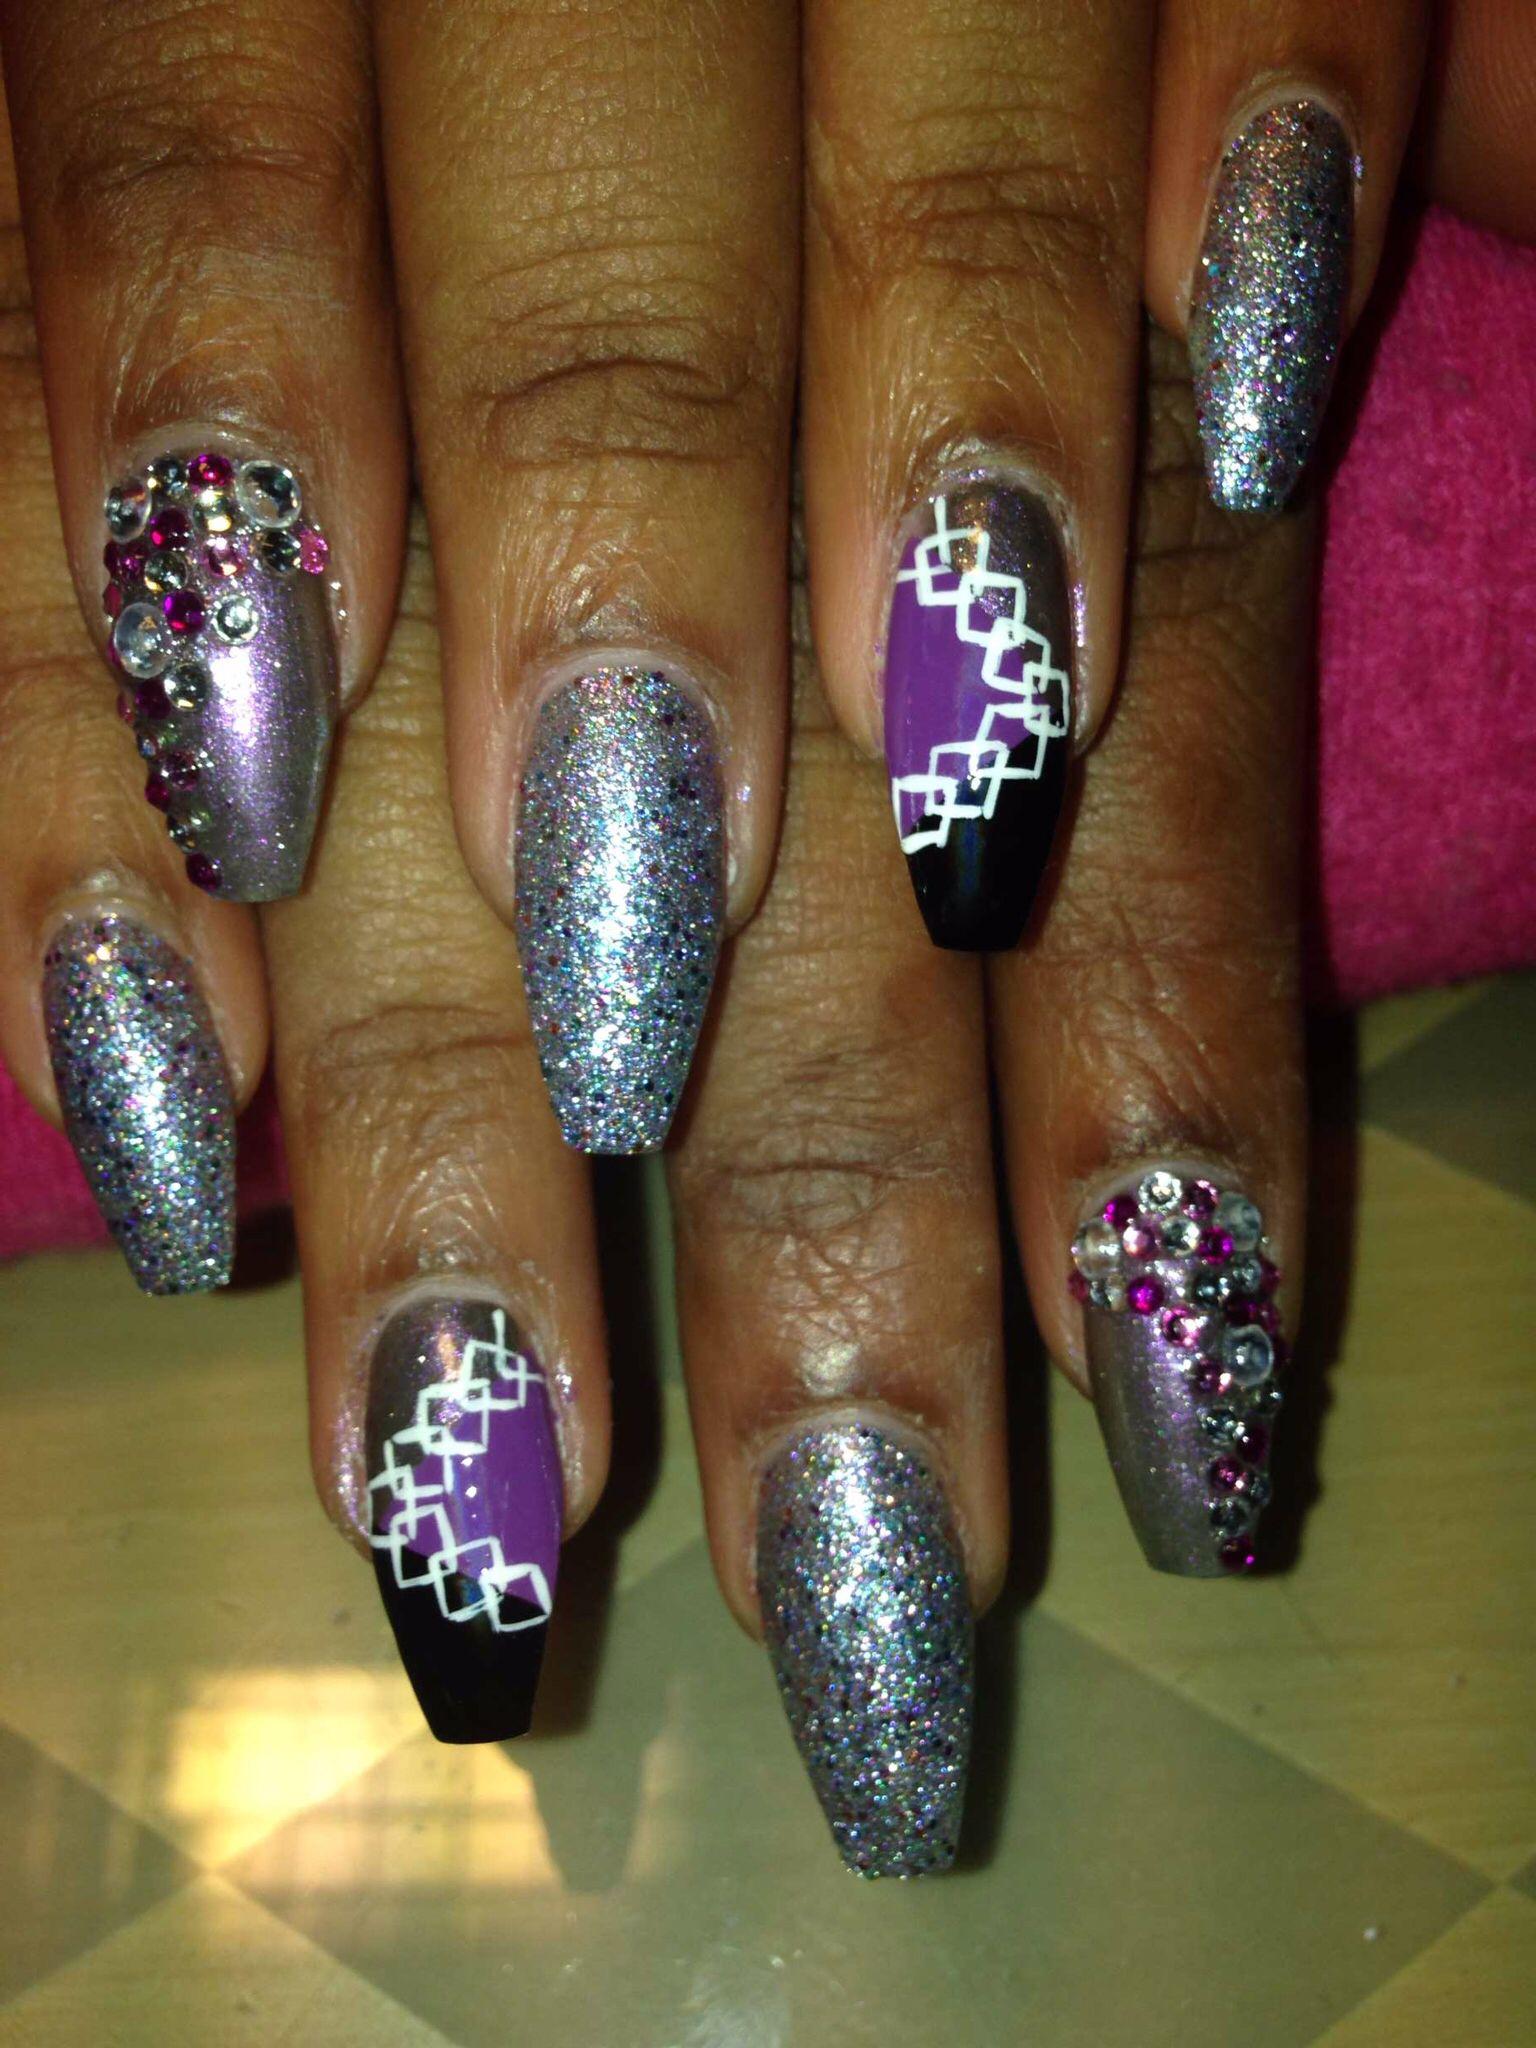 Squared stiletto nail shaped with iridescent silver glitter, purple ...